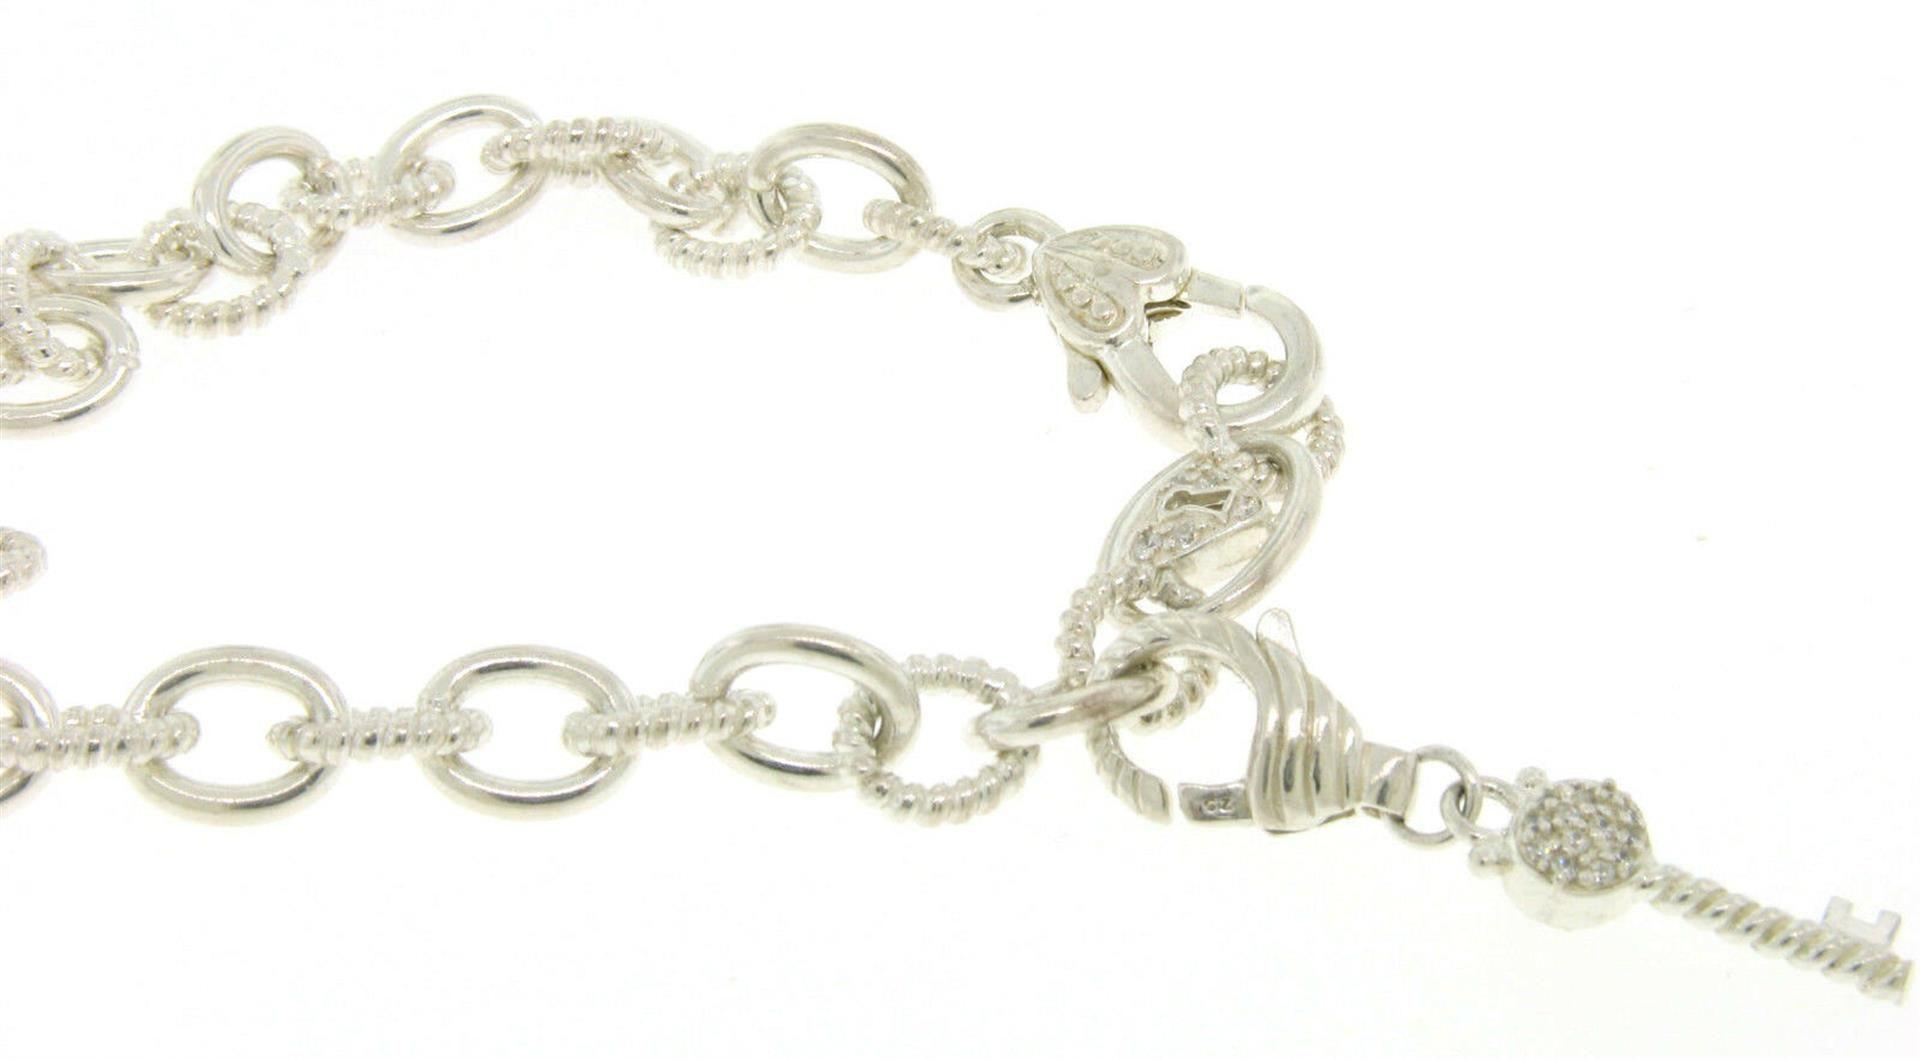 Elaborate JUDITH RIPKA Solid .925 Sterling Silver Chain w/ Diamonique Key Enhanc - Image 3 of 3